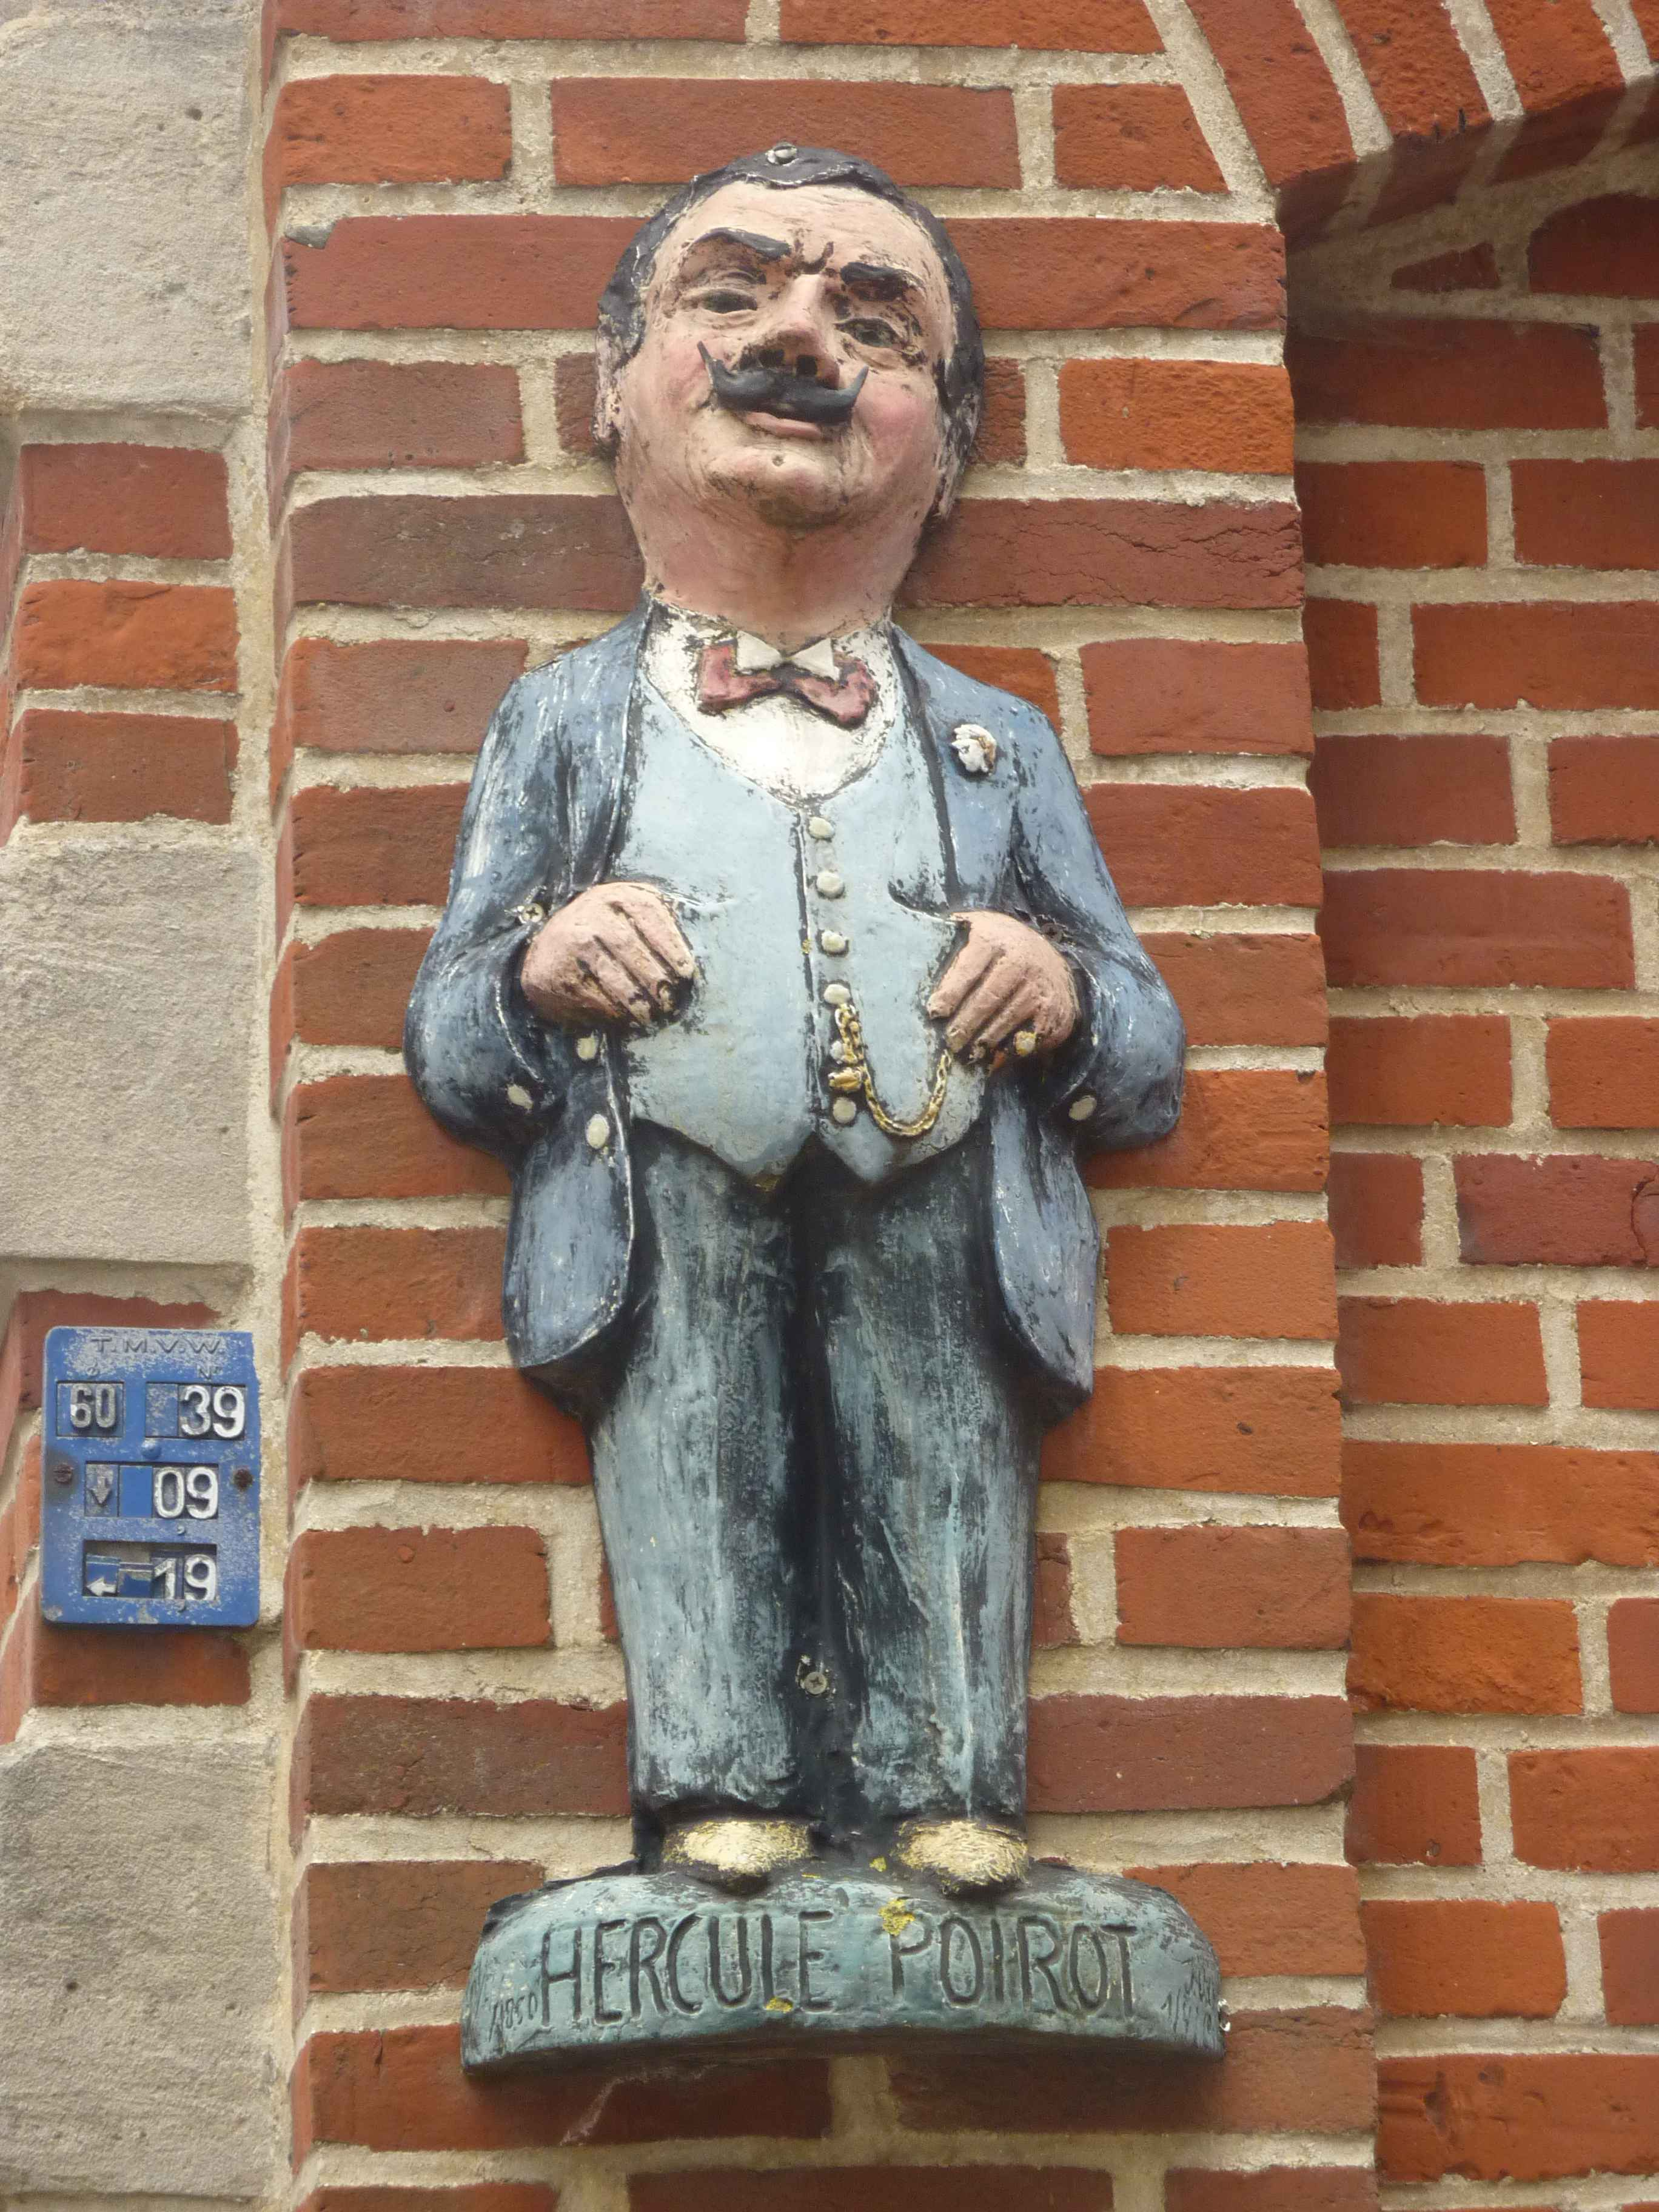 Estátua de Hercule Poirot, em Ellezelles, na Bélgica